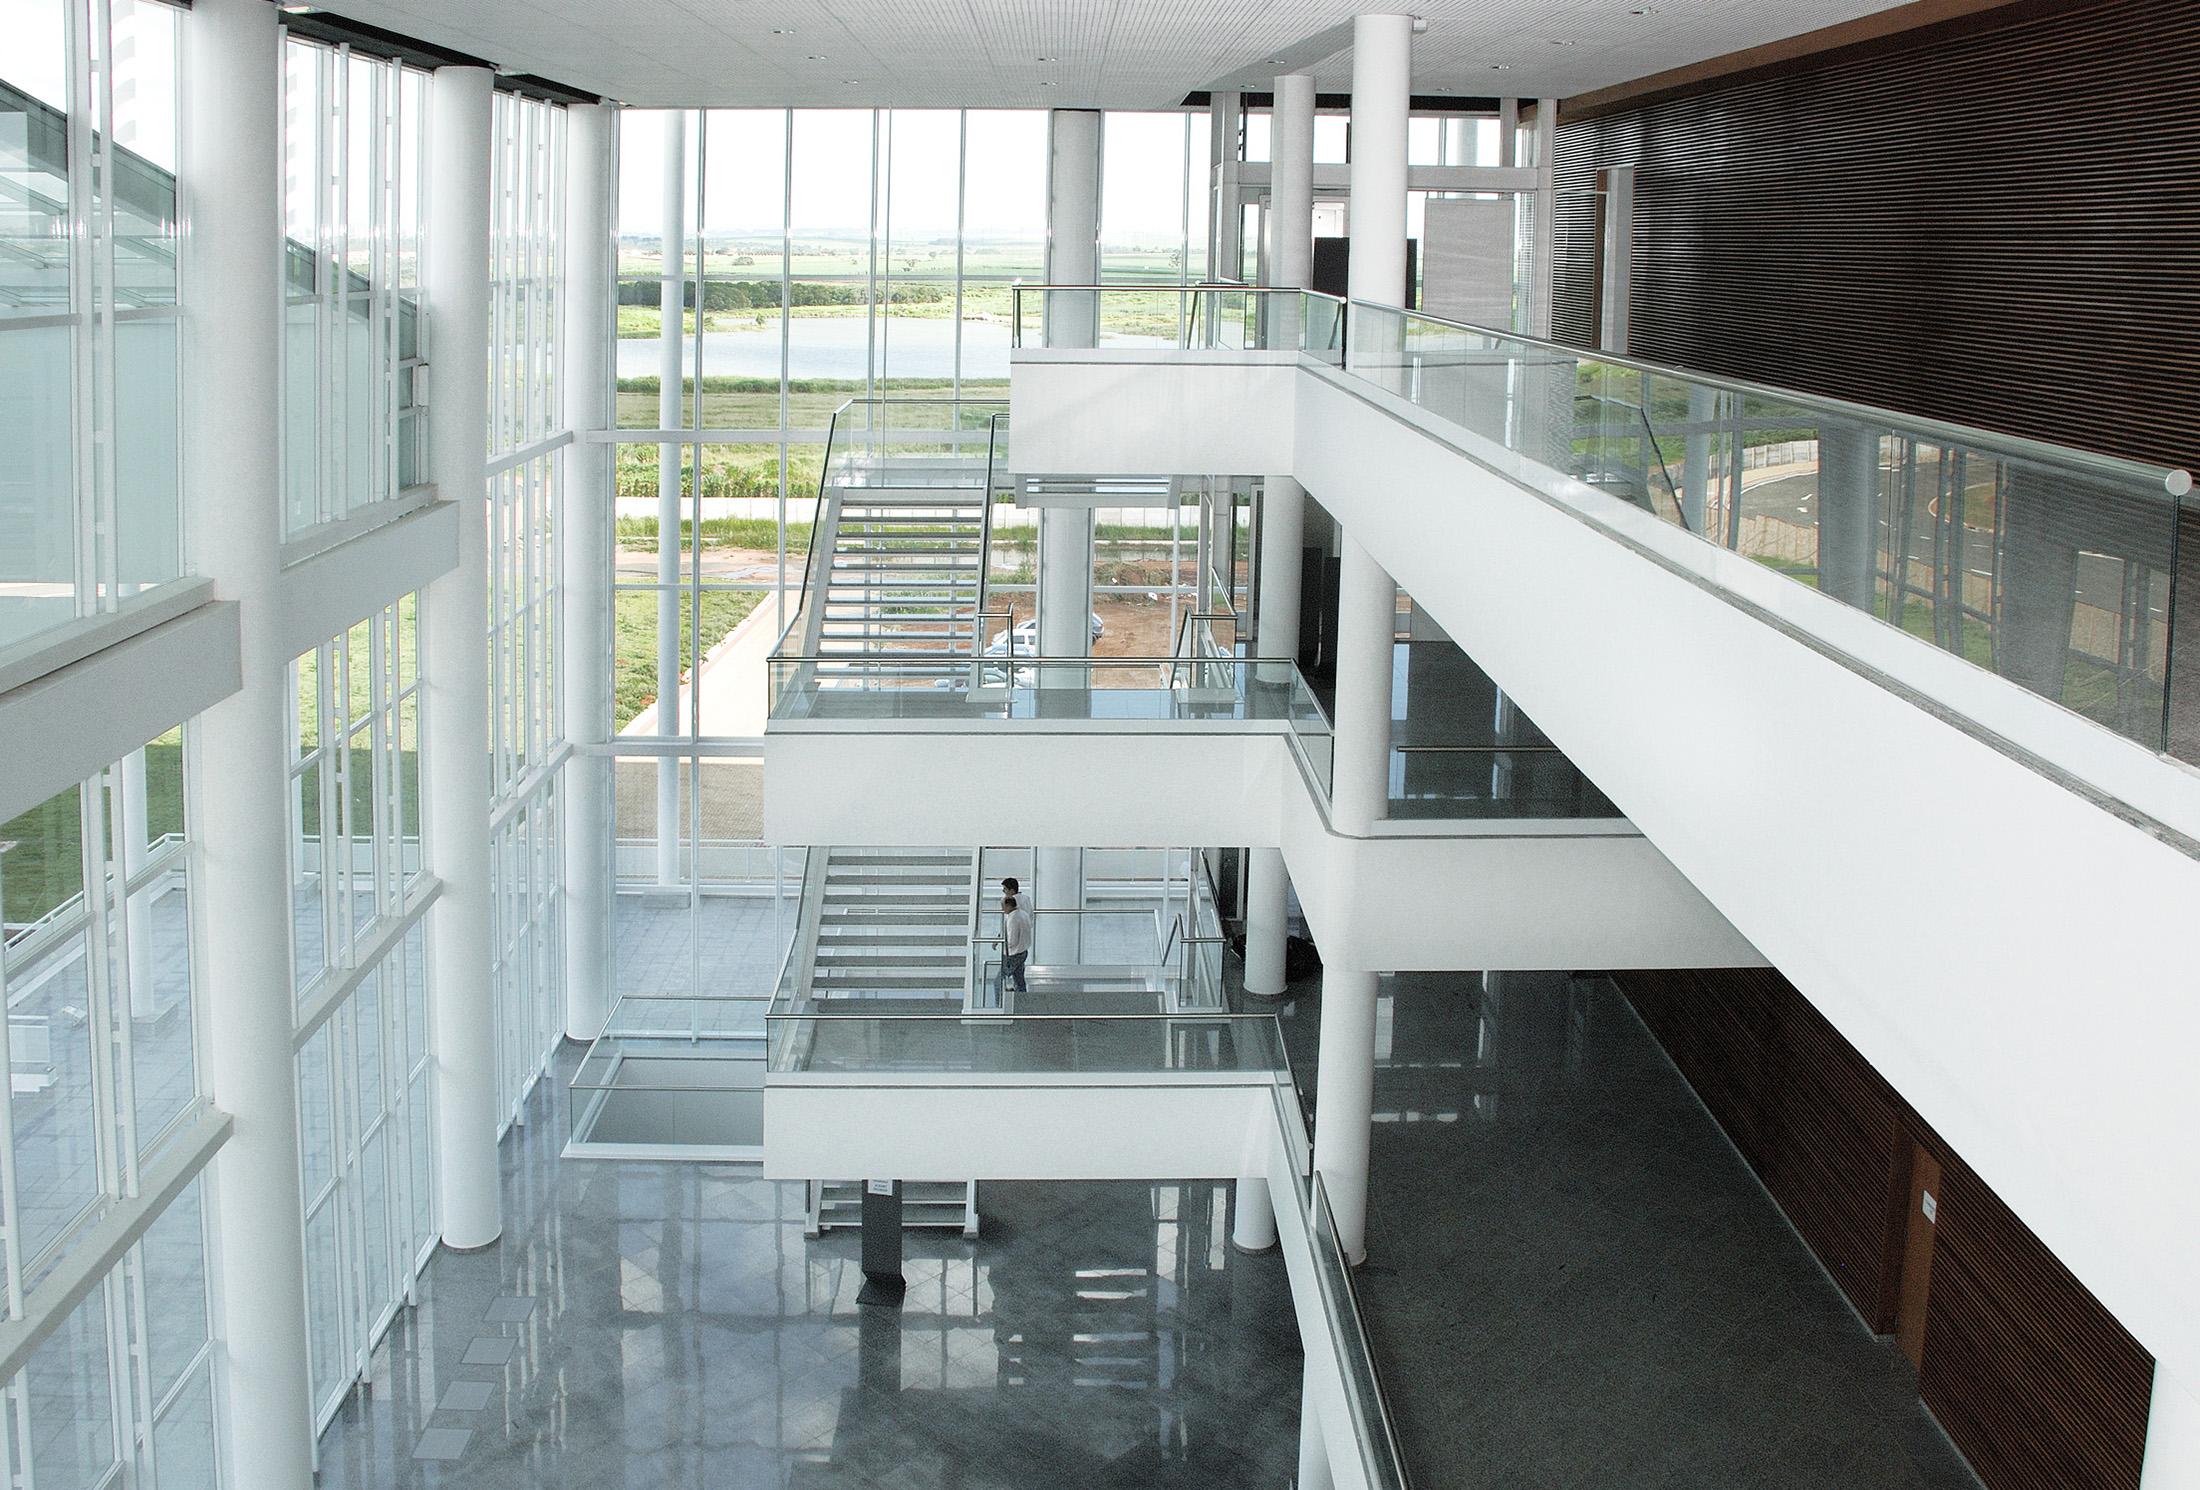 Theatro Municipal de Paulínia Slide 01